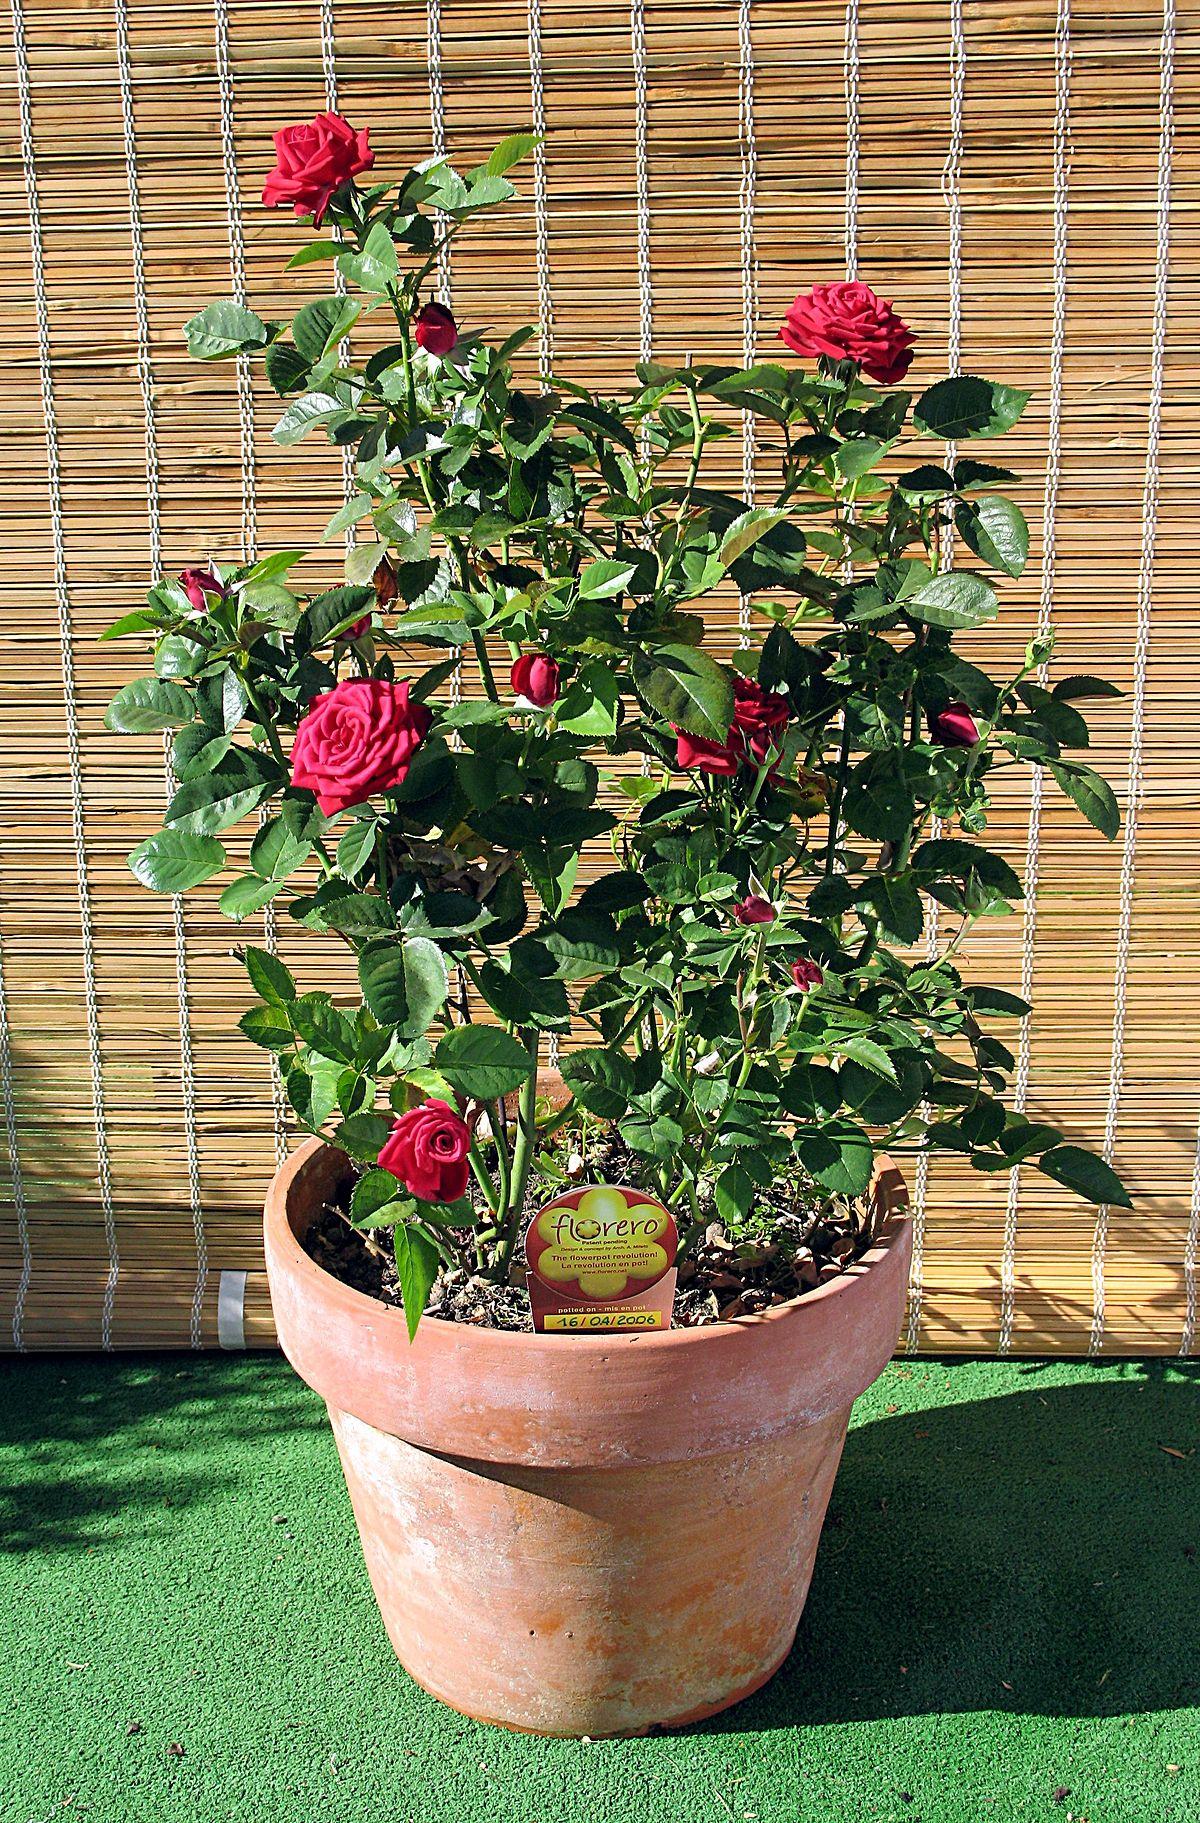 Miniatura rosa wikipedia la enciclopedia libre for Algunas plantas ornamentales